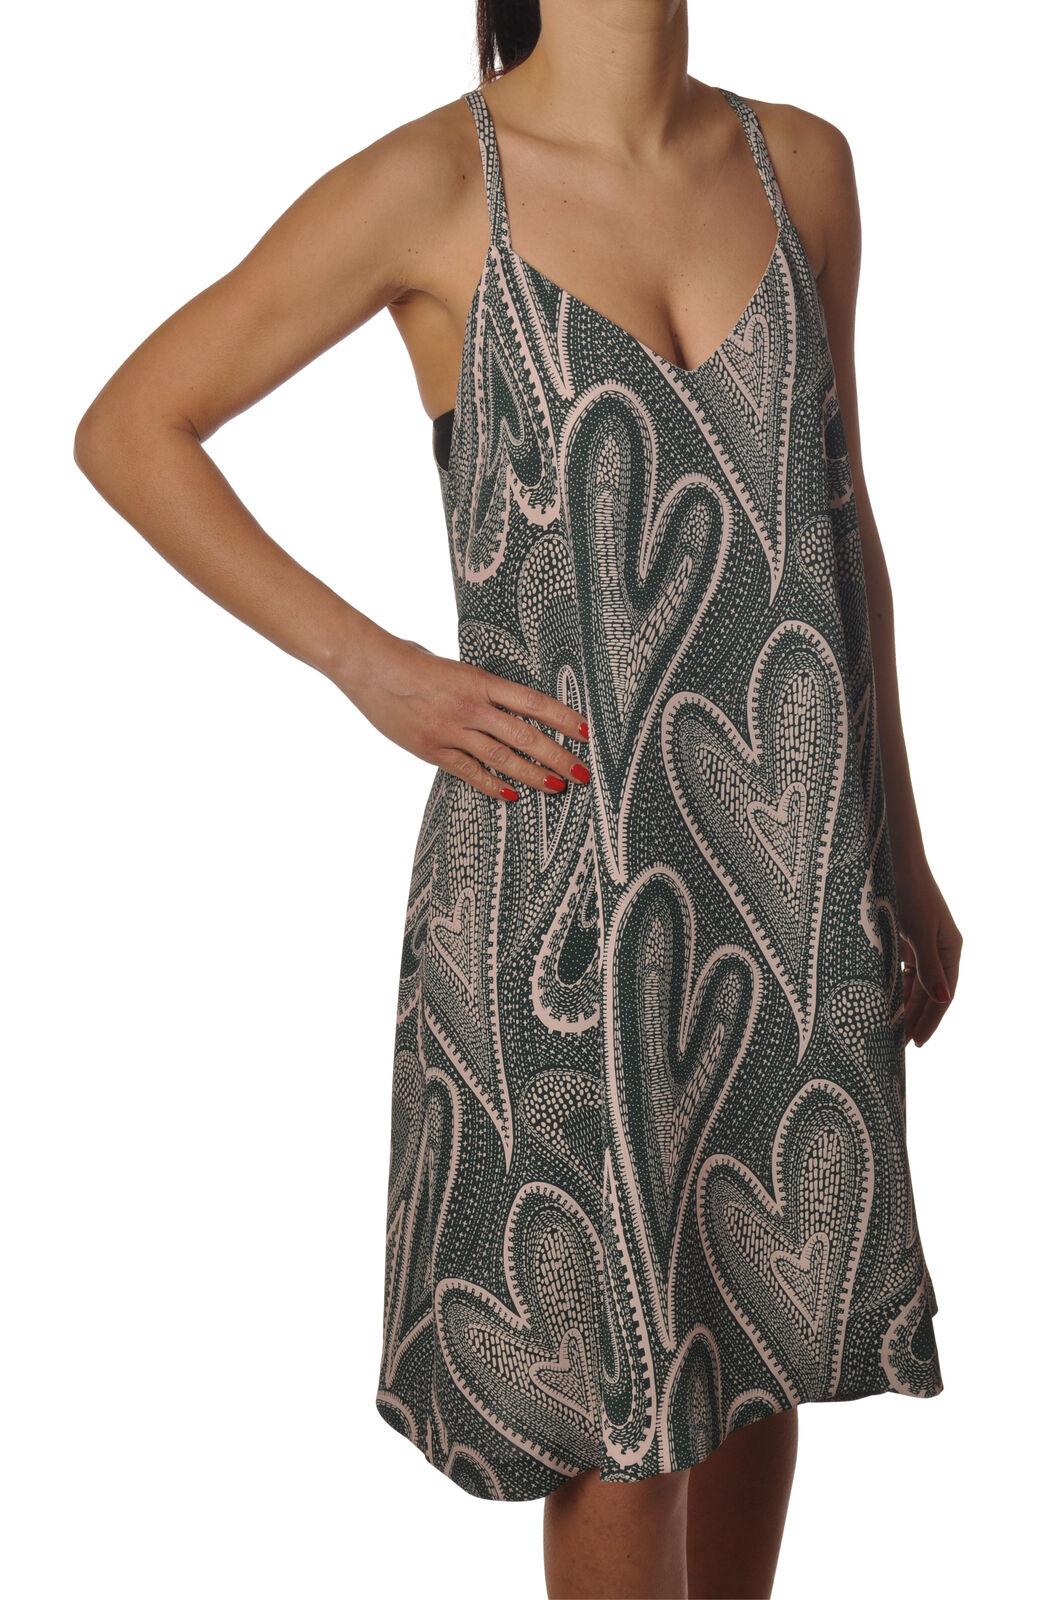 Ottod'ame - Dresses-Dress - Woman - Fantasy - 6140627C191055